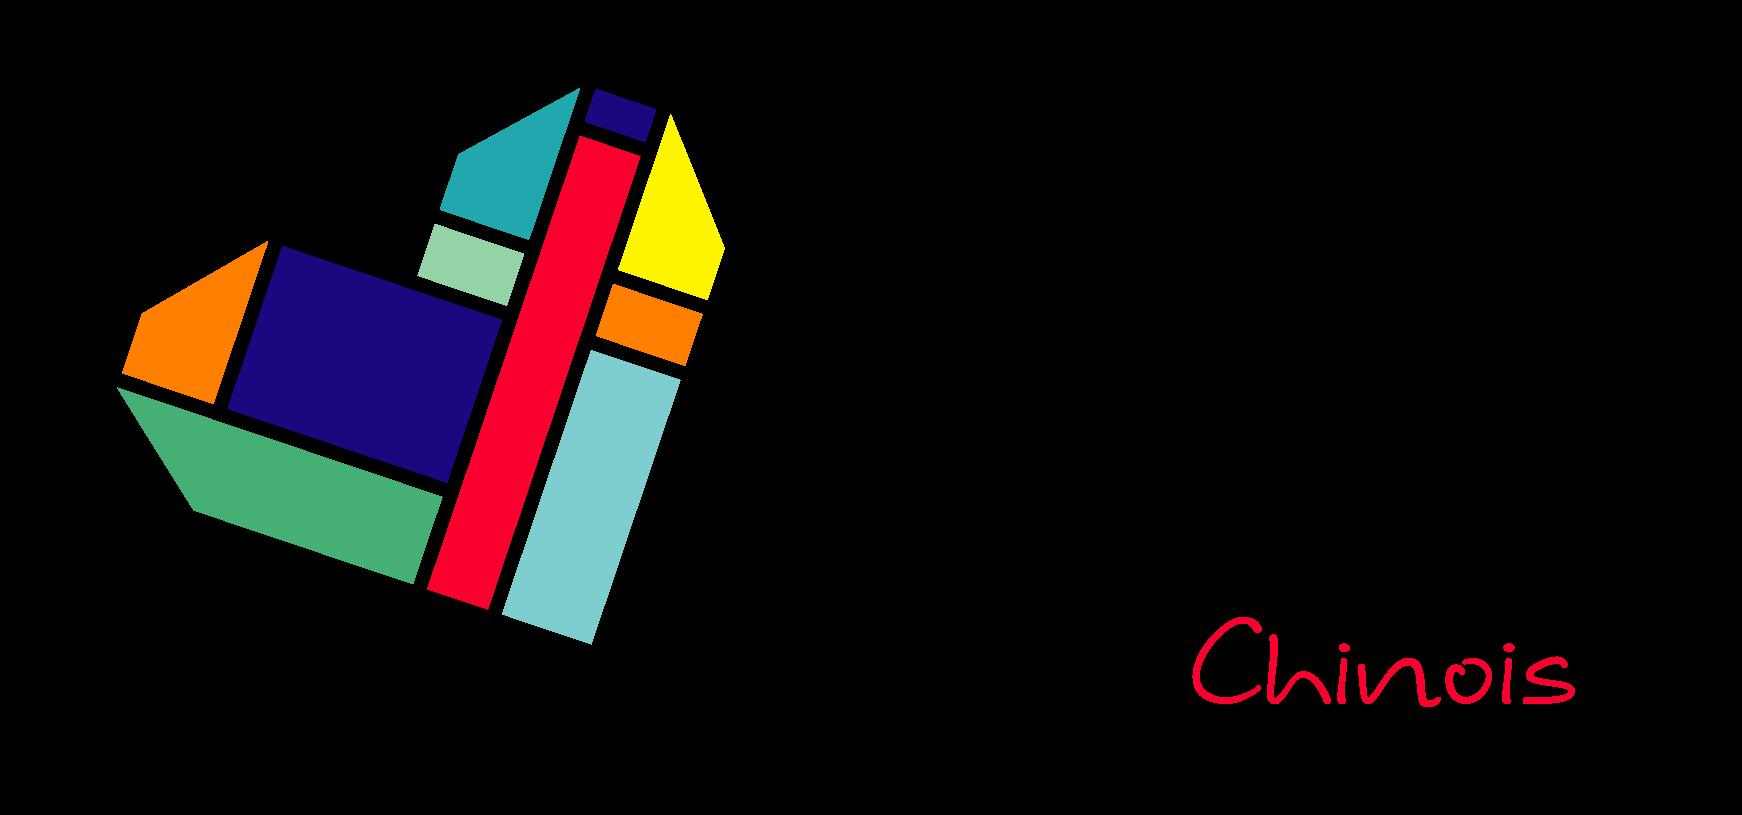 AGAPE-campus-chinois-logo-01